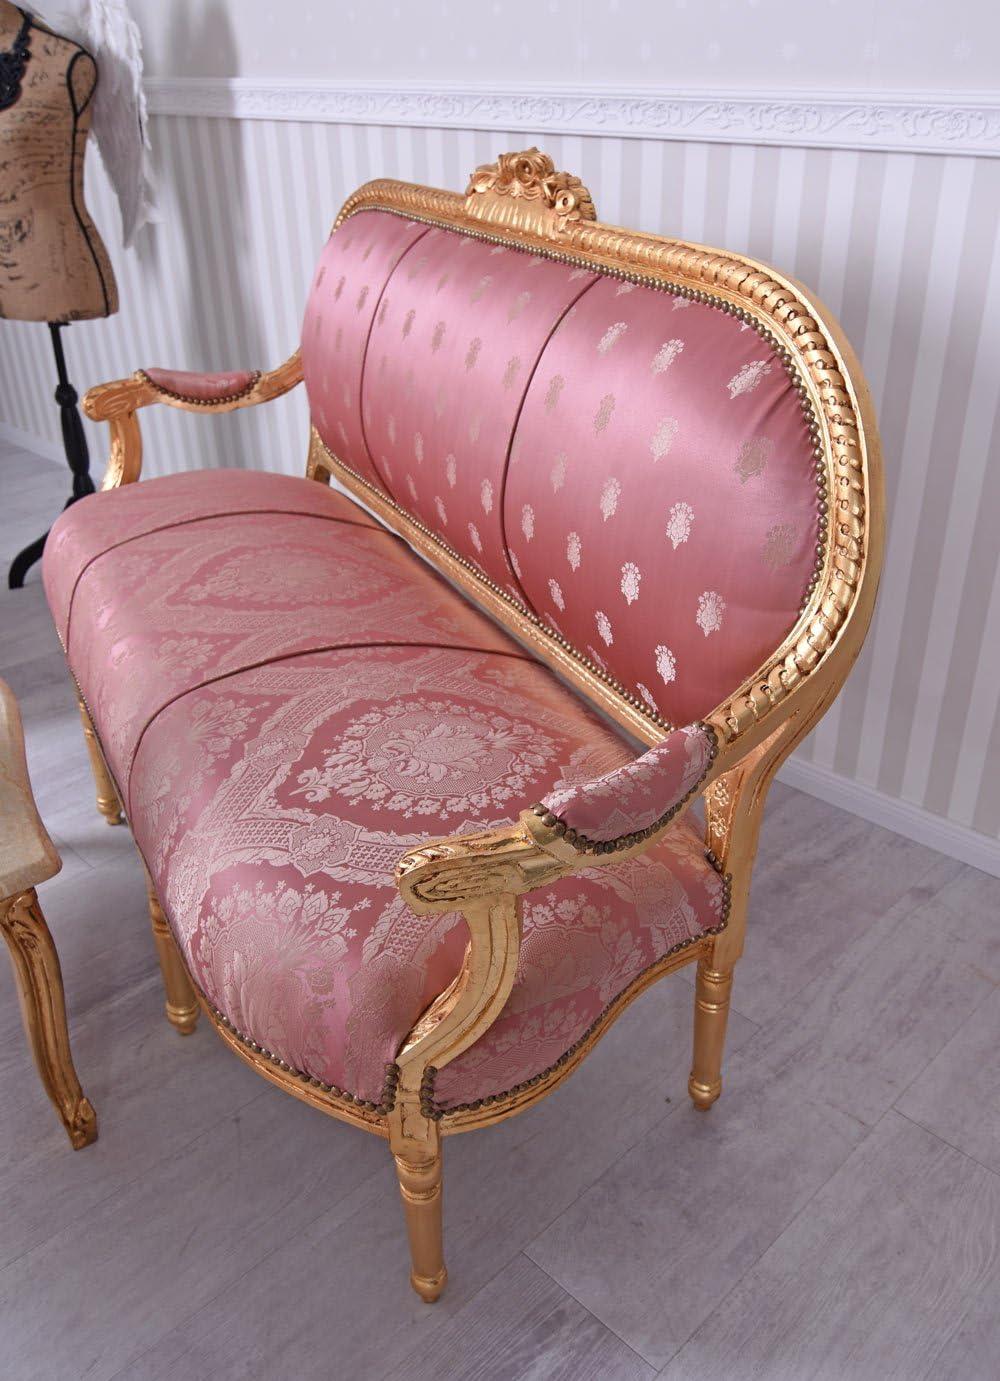 Sitzmöbel Sitzgarnitur XXL Barockmöbel Salongarnitur Sitzgruppe Sofagarnitur